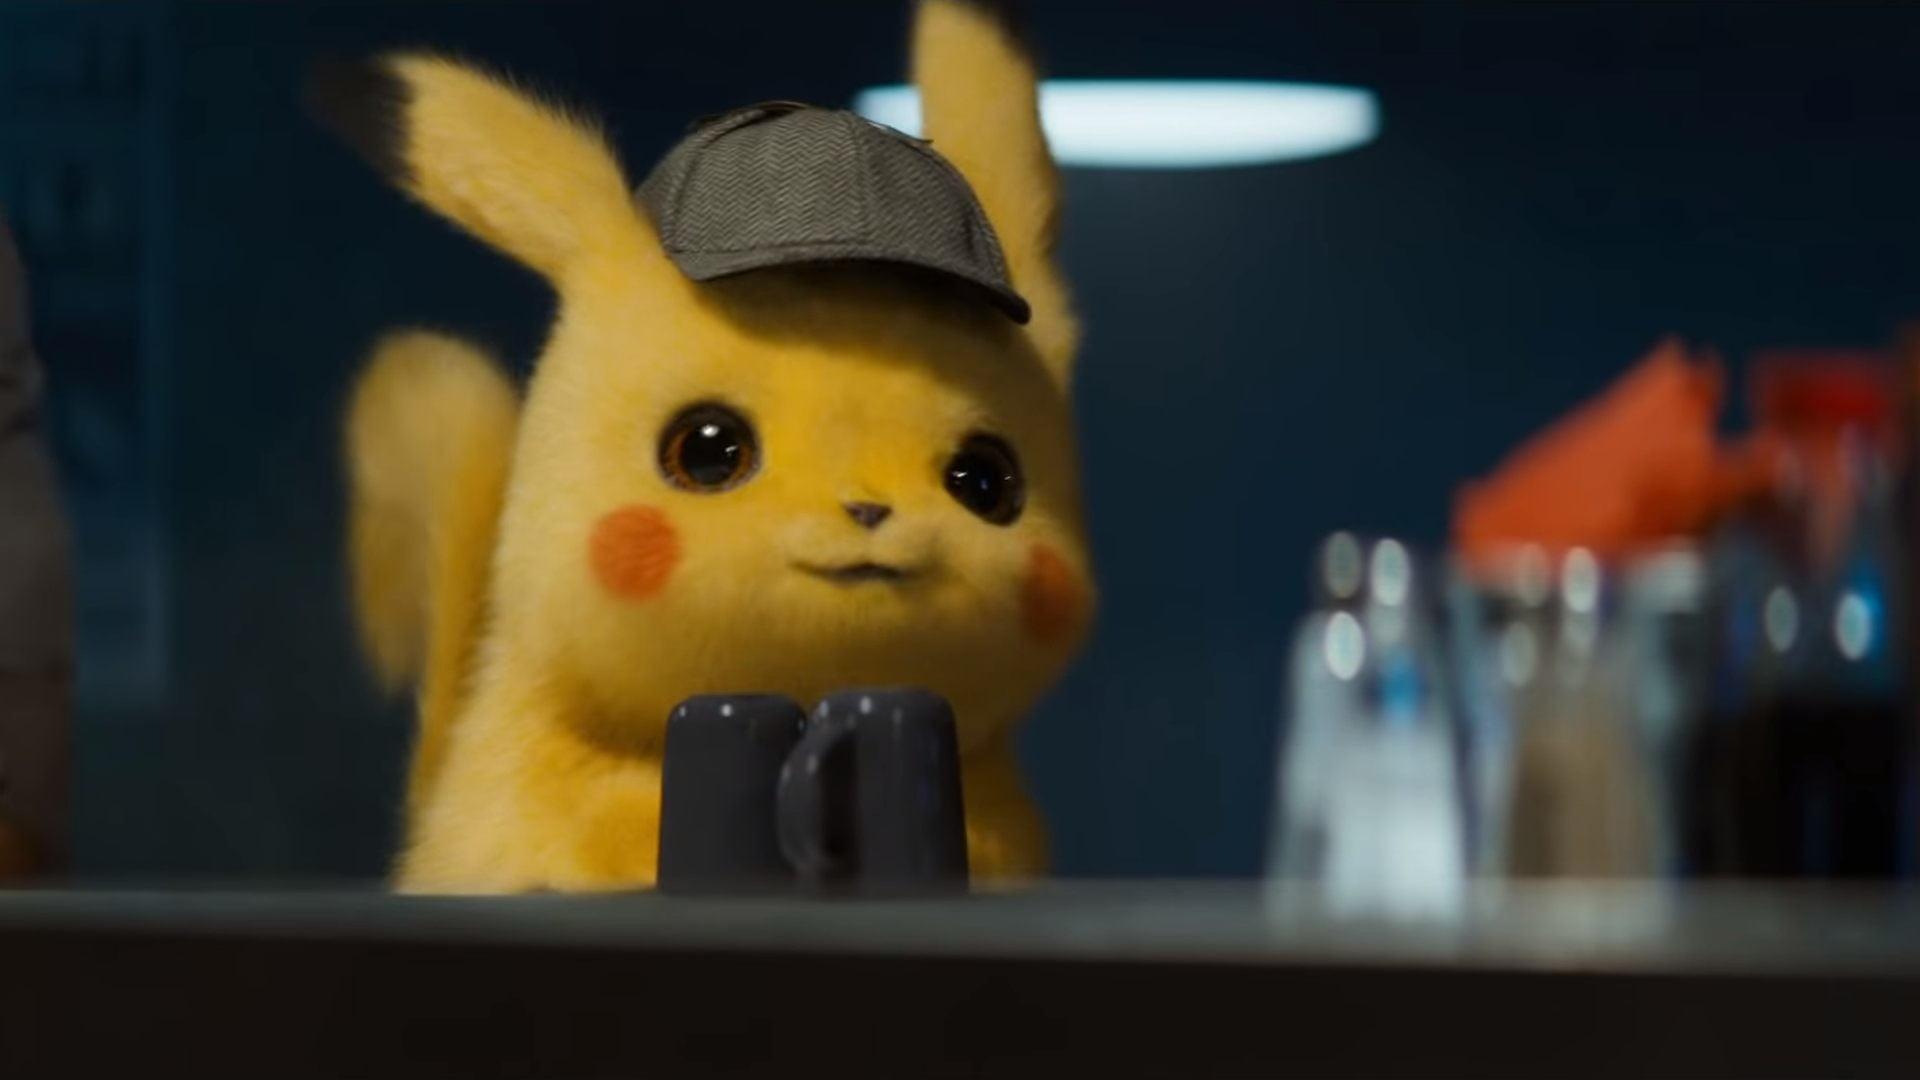 Download Detective Pikachu Wallpaper Hd Backgrounds